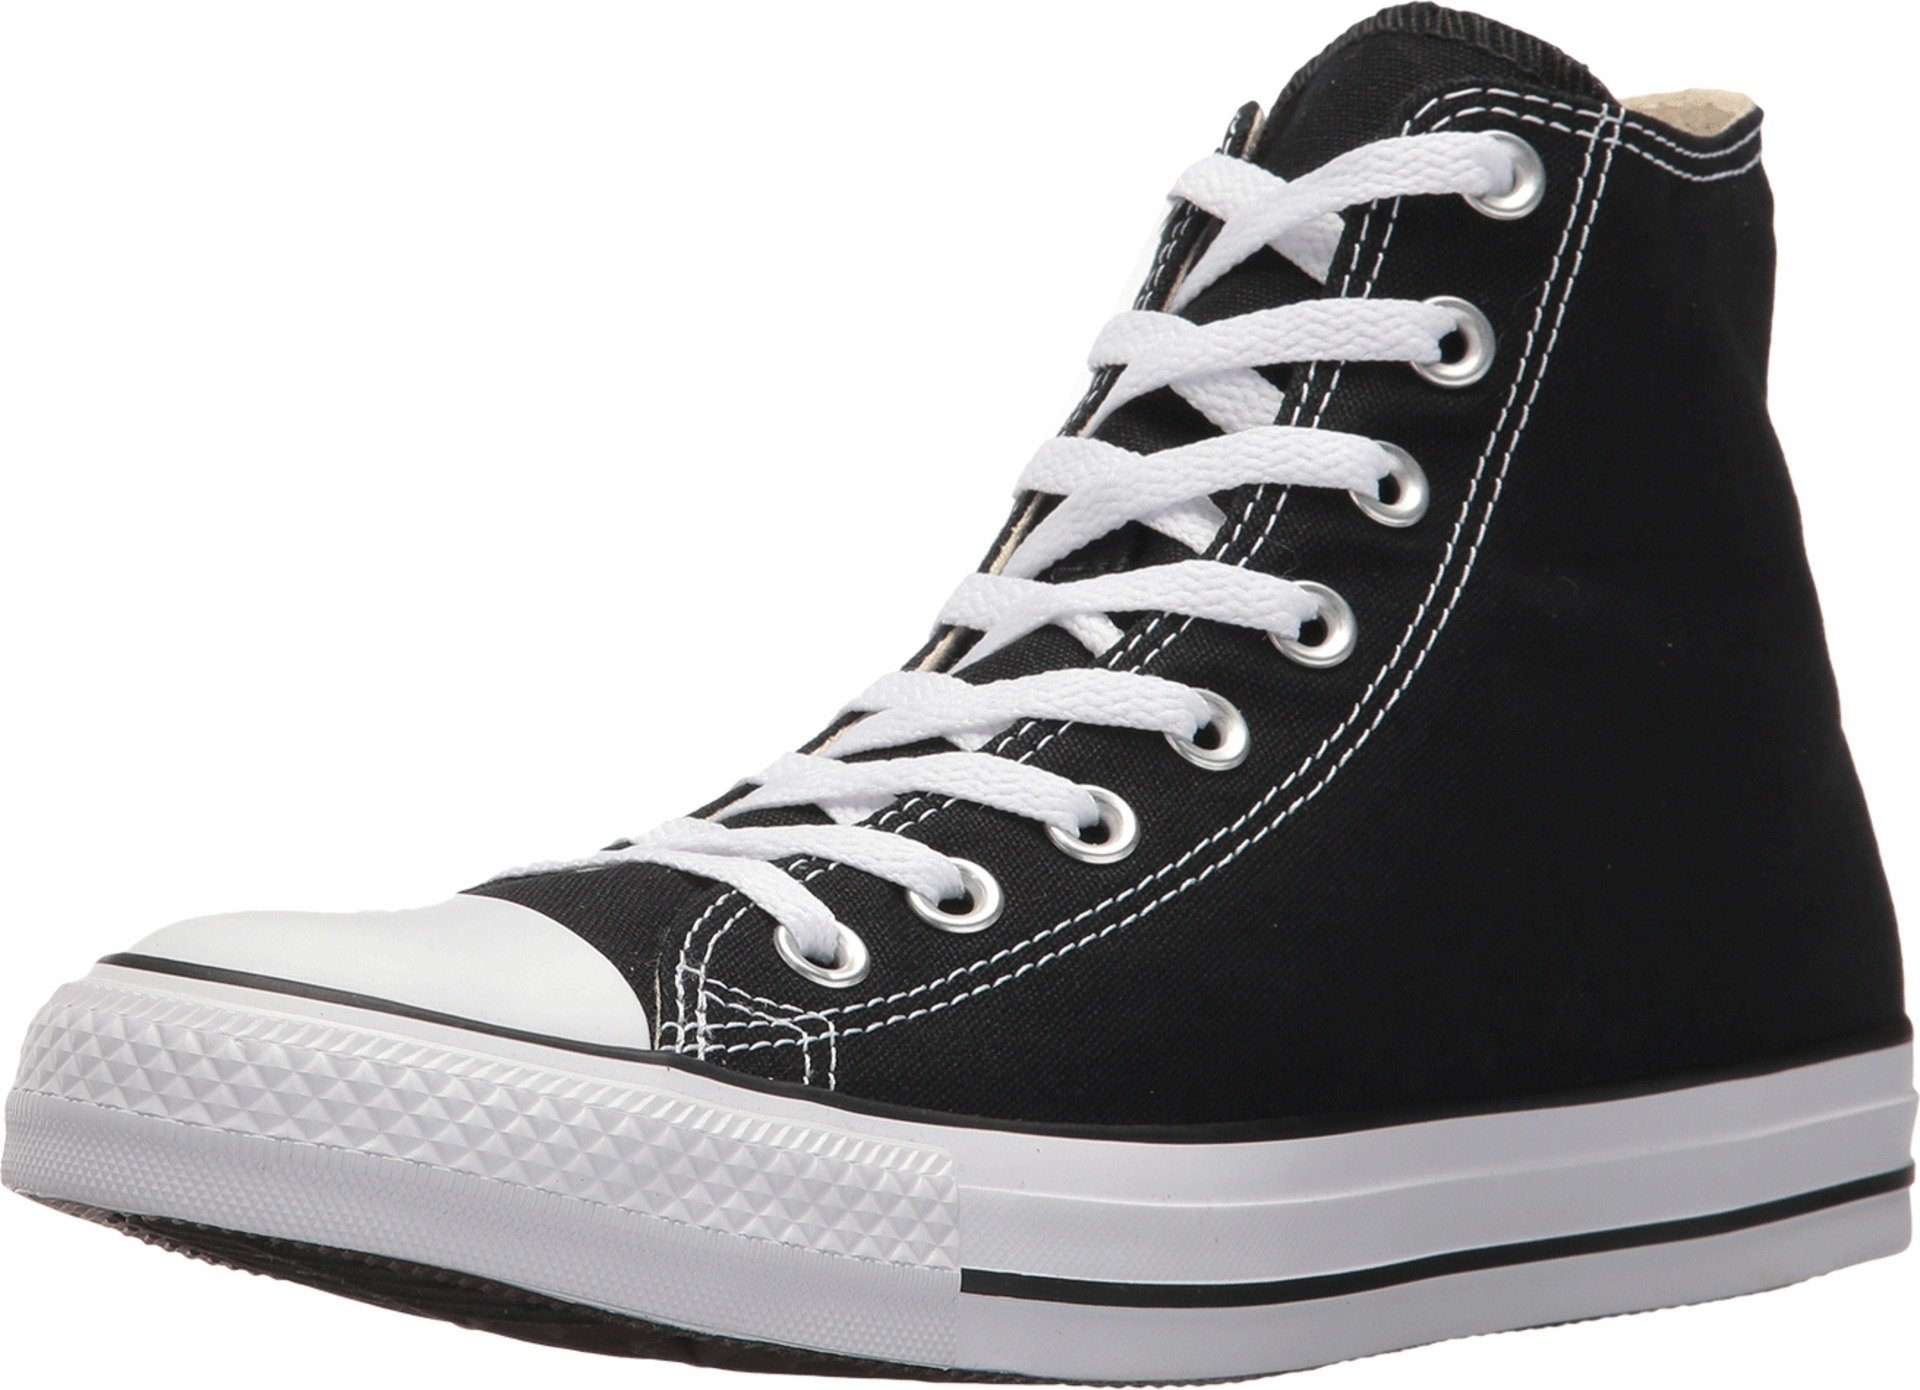 Converse Chuck Taylor All Star Hi Metallic Sneaker